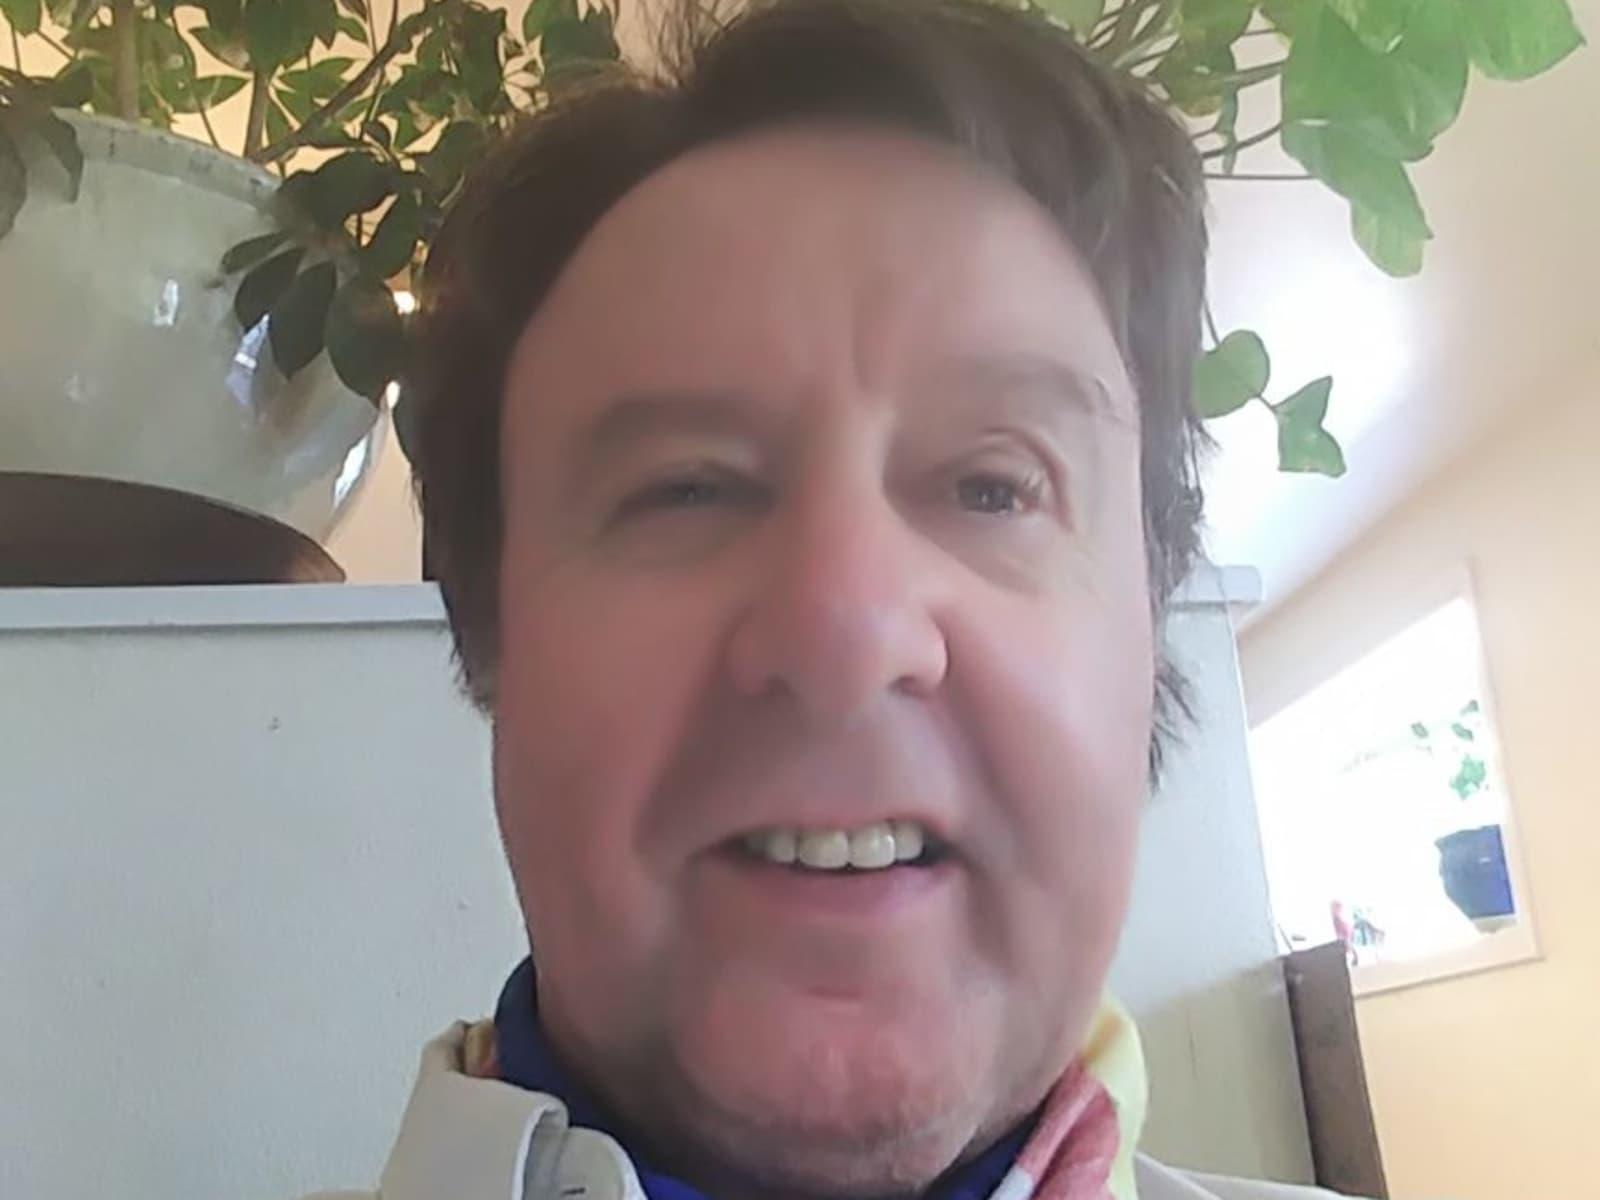 Gary from Rapid City, South Dakota, United States